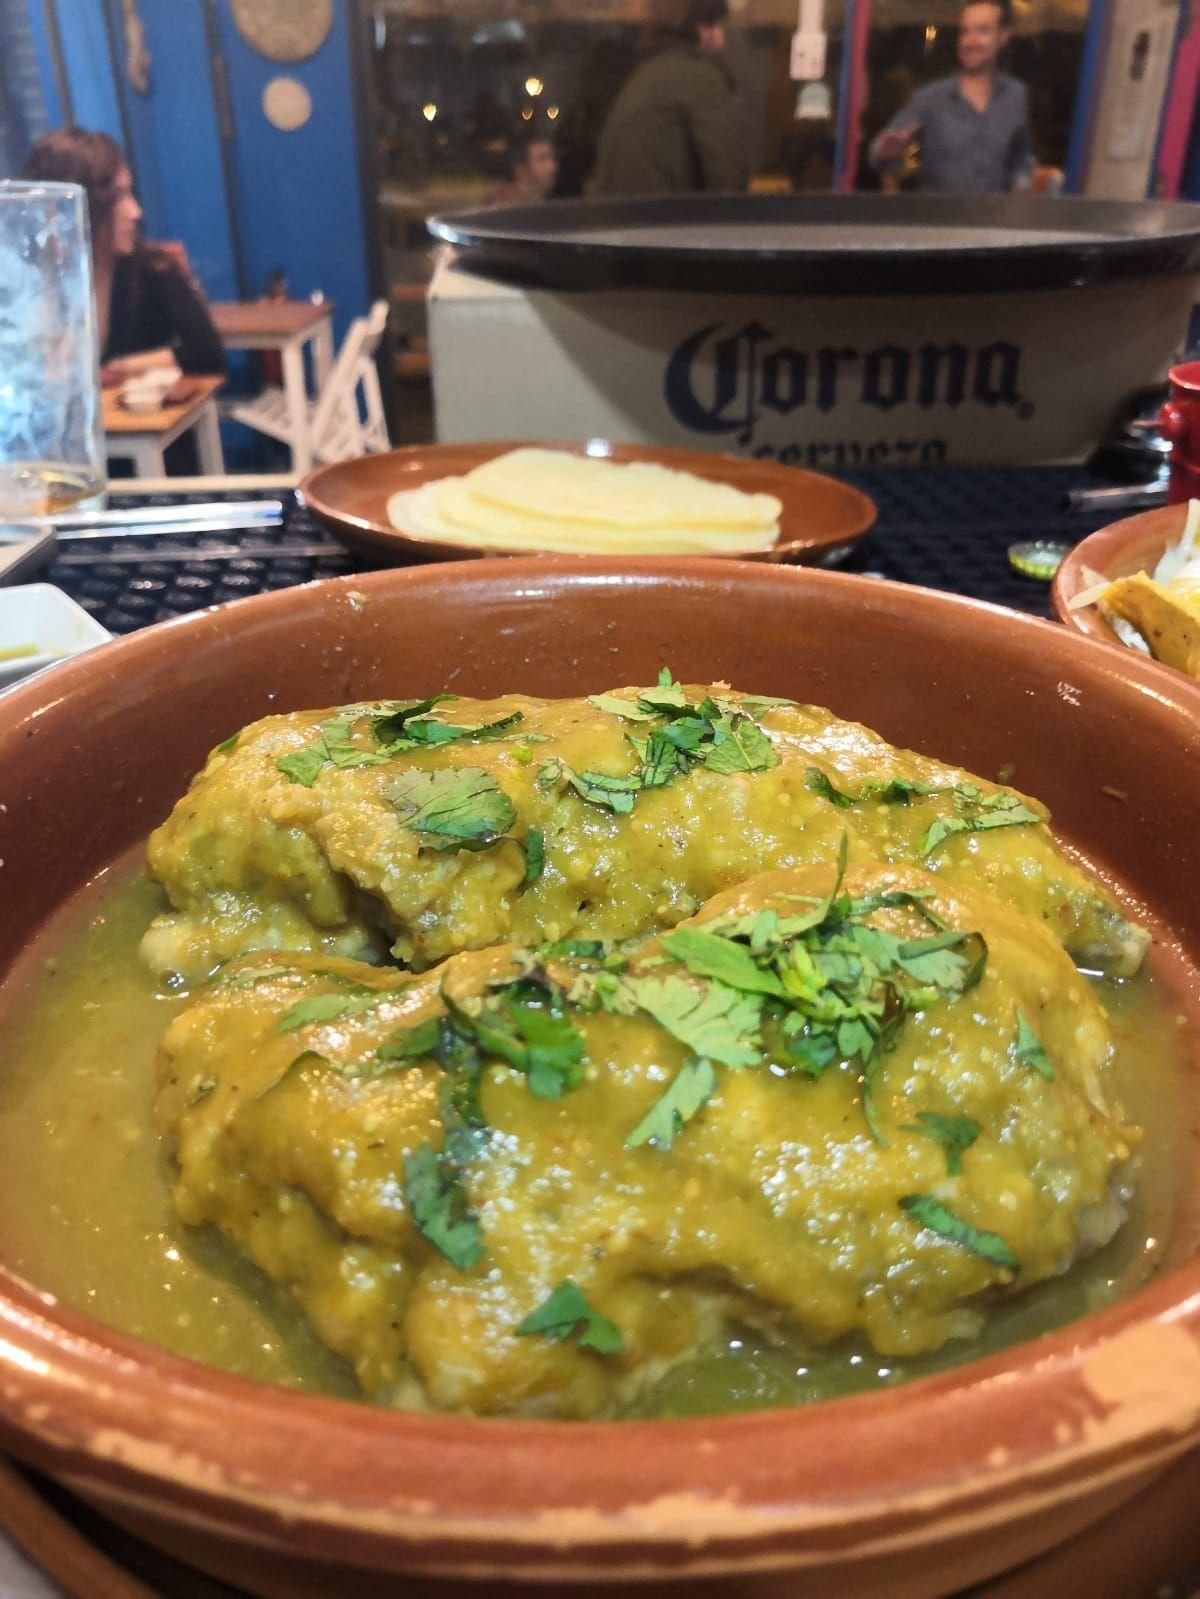 Foto 16 de Restaurante mexicano en    Cantina La Catrina